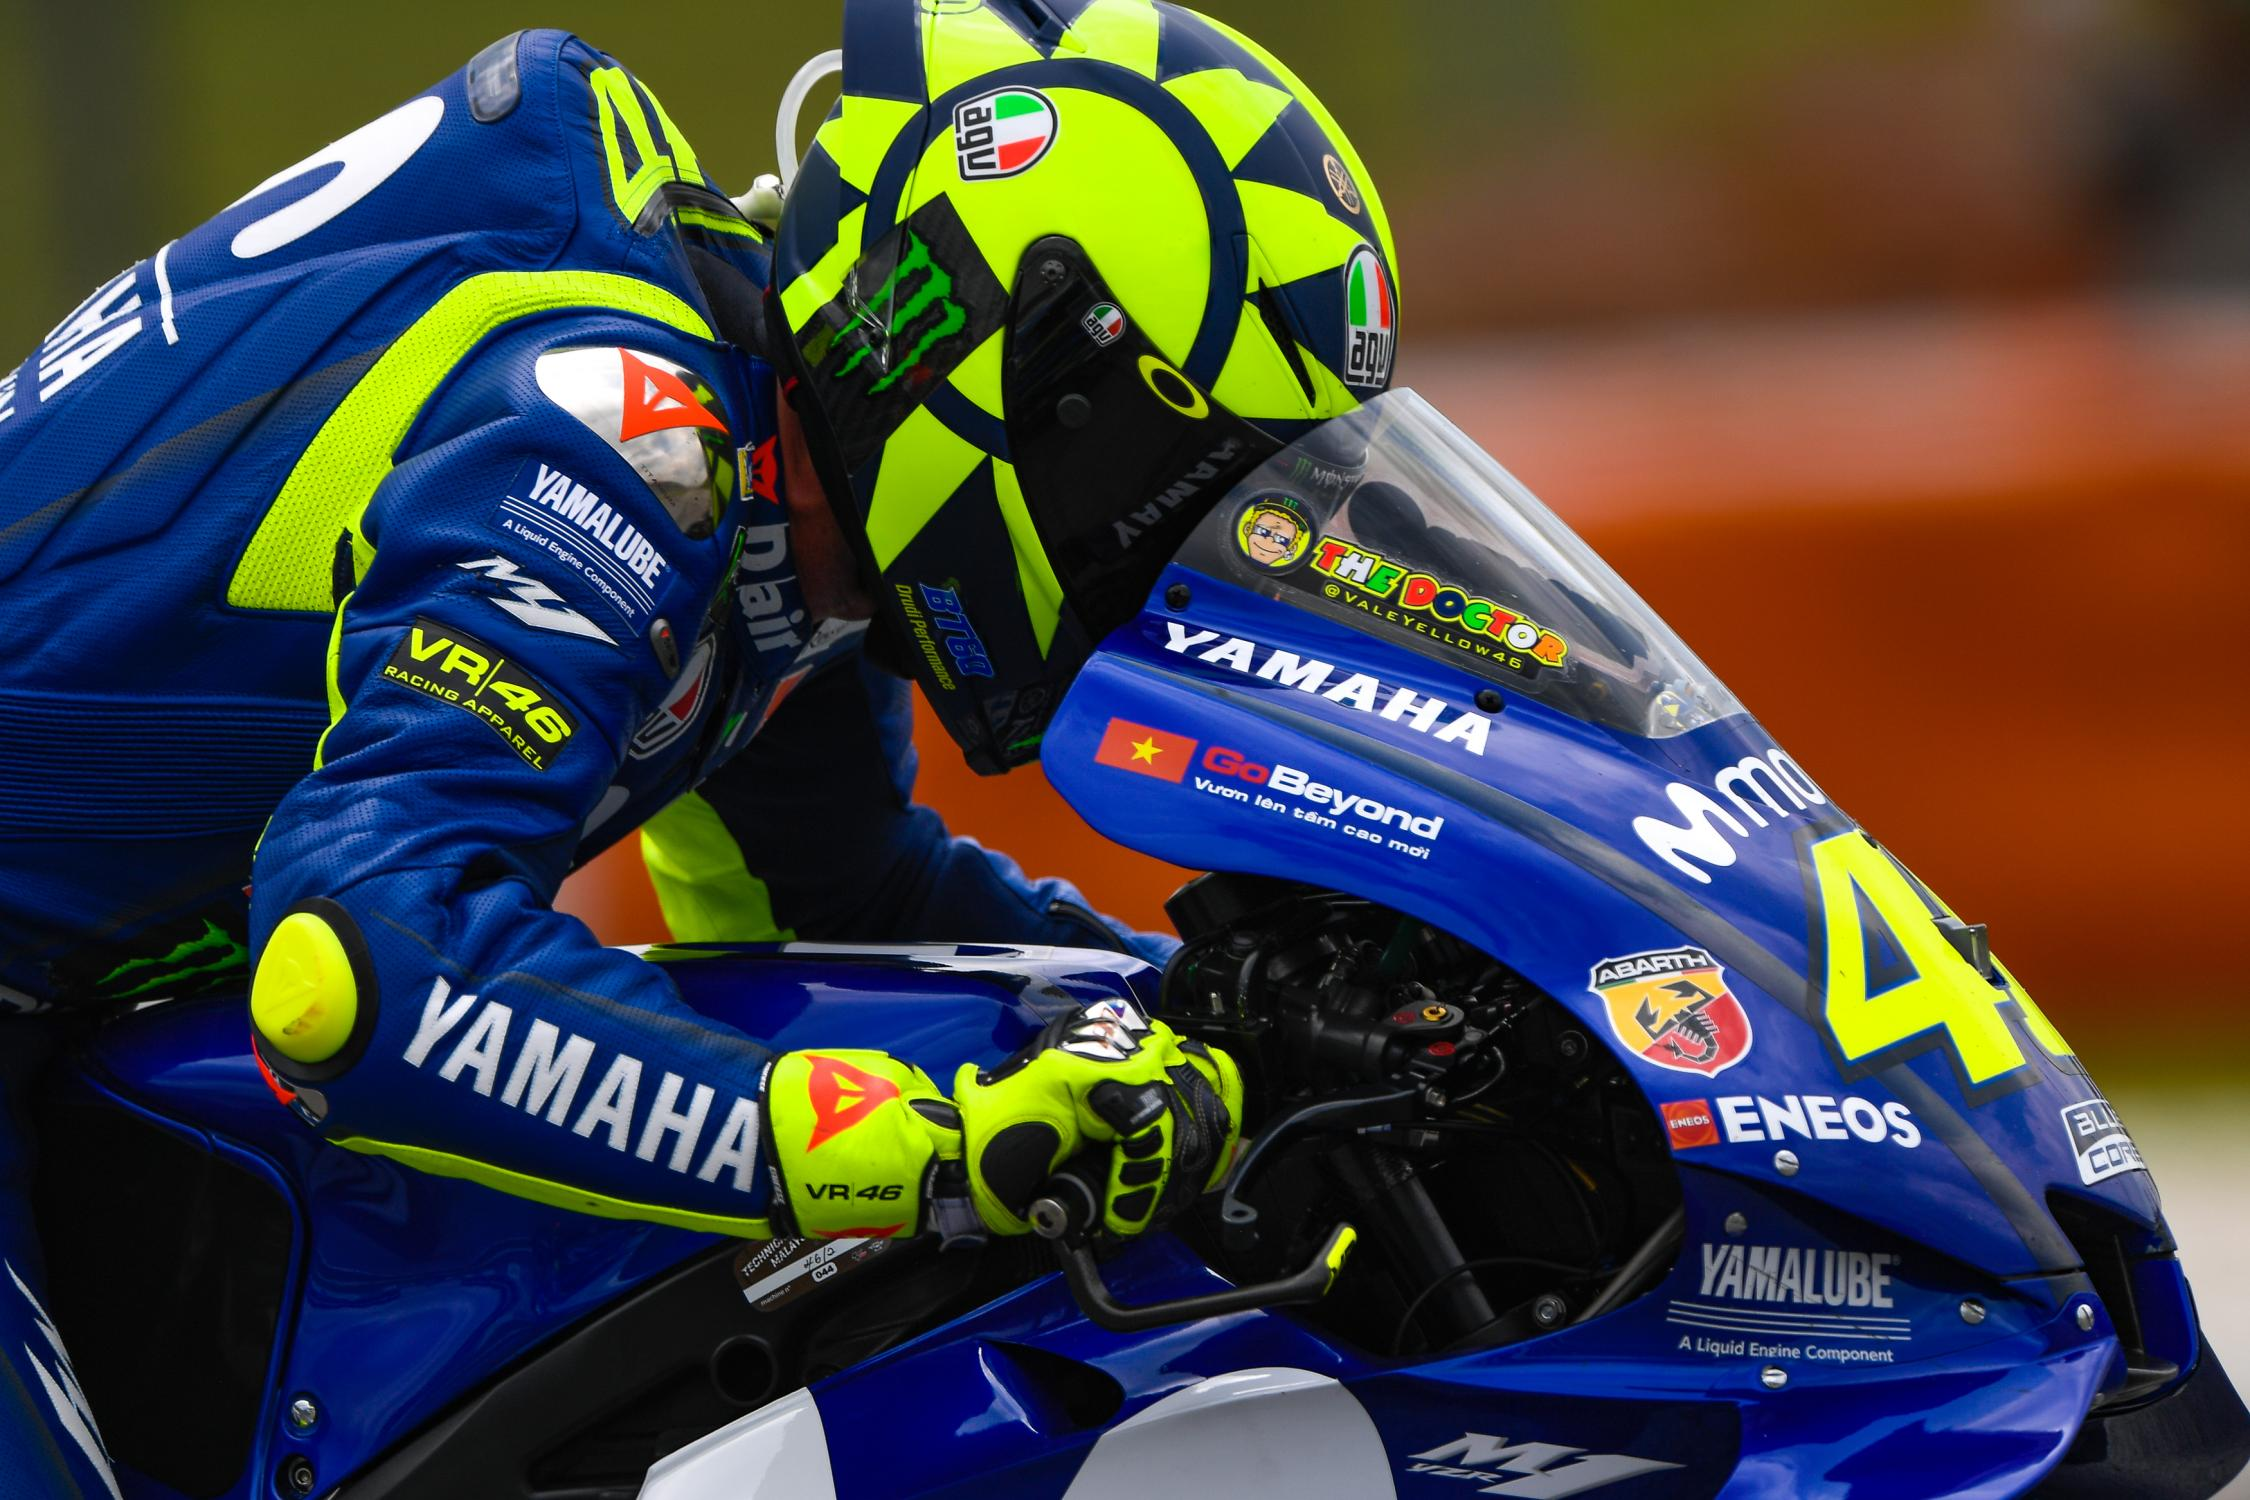 Výsledky závodu MotoGP Malajsie 2018